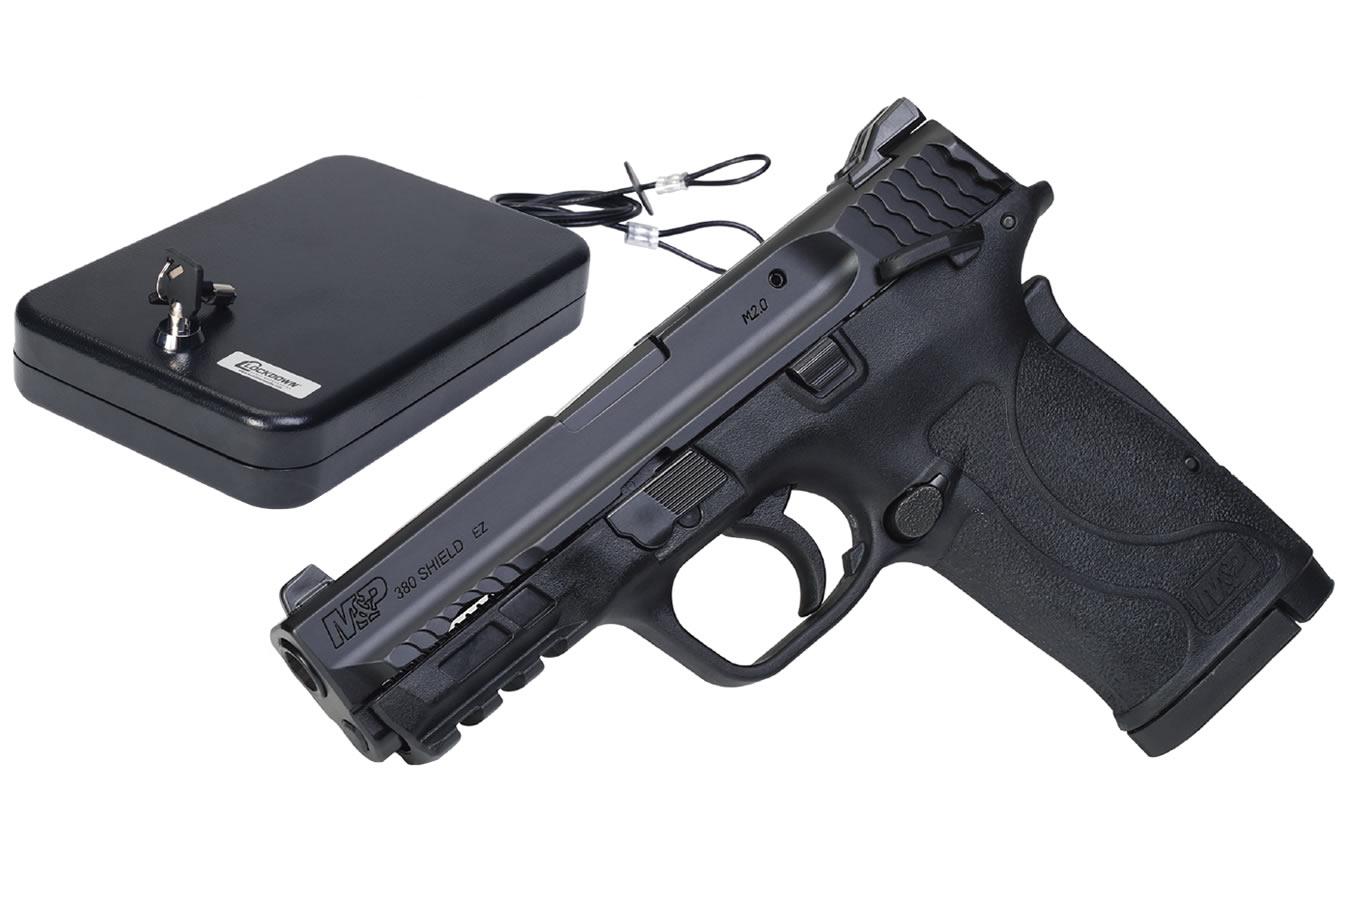 Boyt gun vault manual